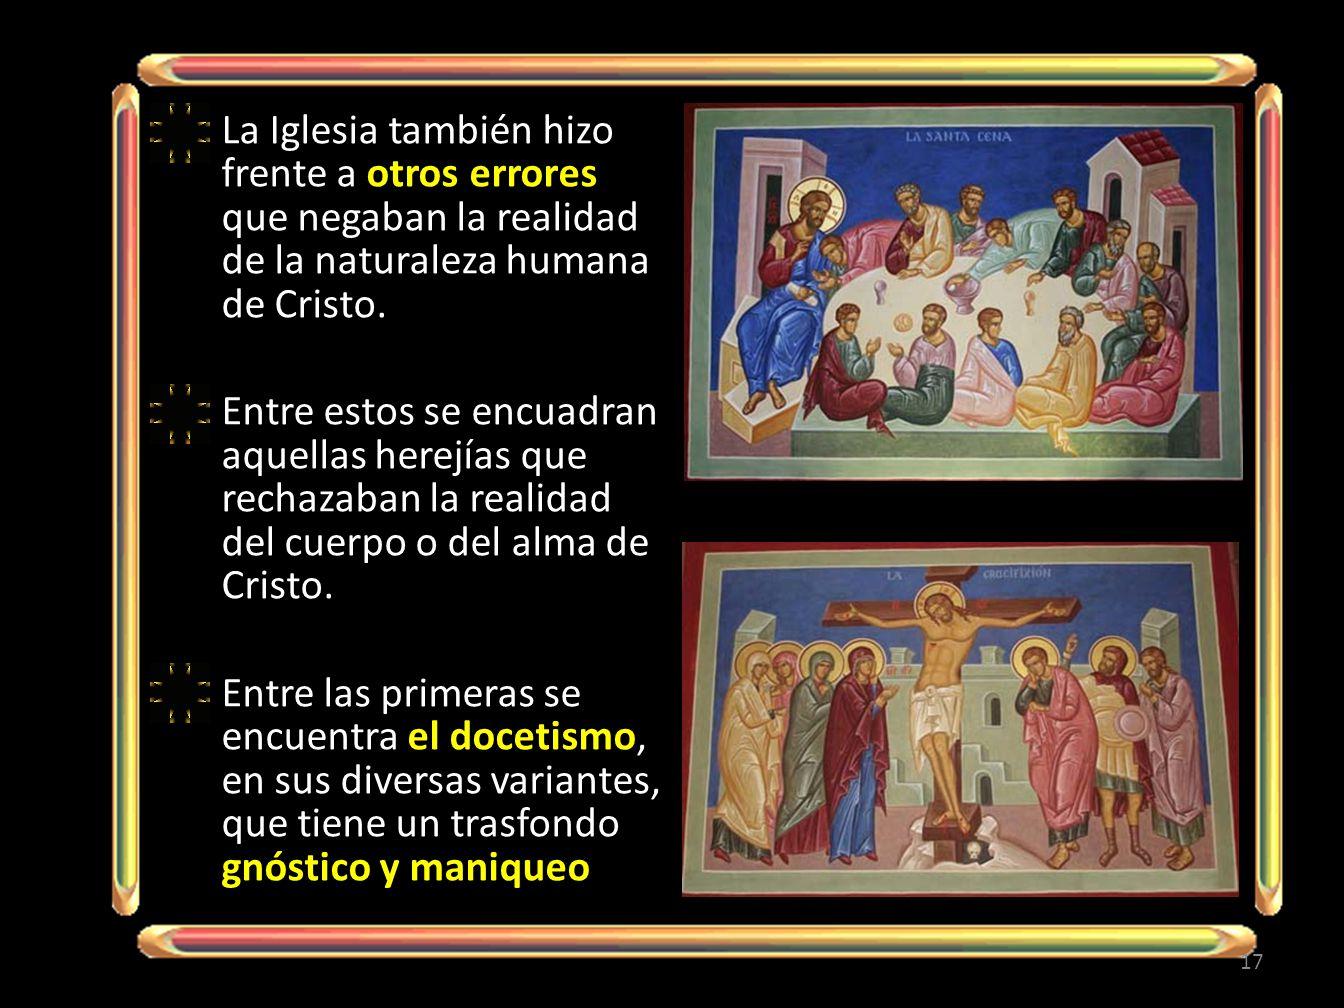 La Iglesia también hizo frente a otros errores que negaban la realidad de la naturaleza humana de Cristo.